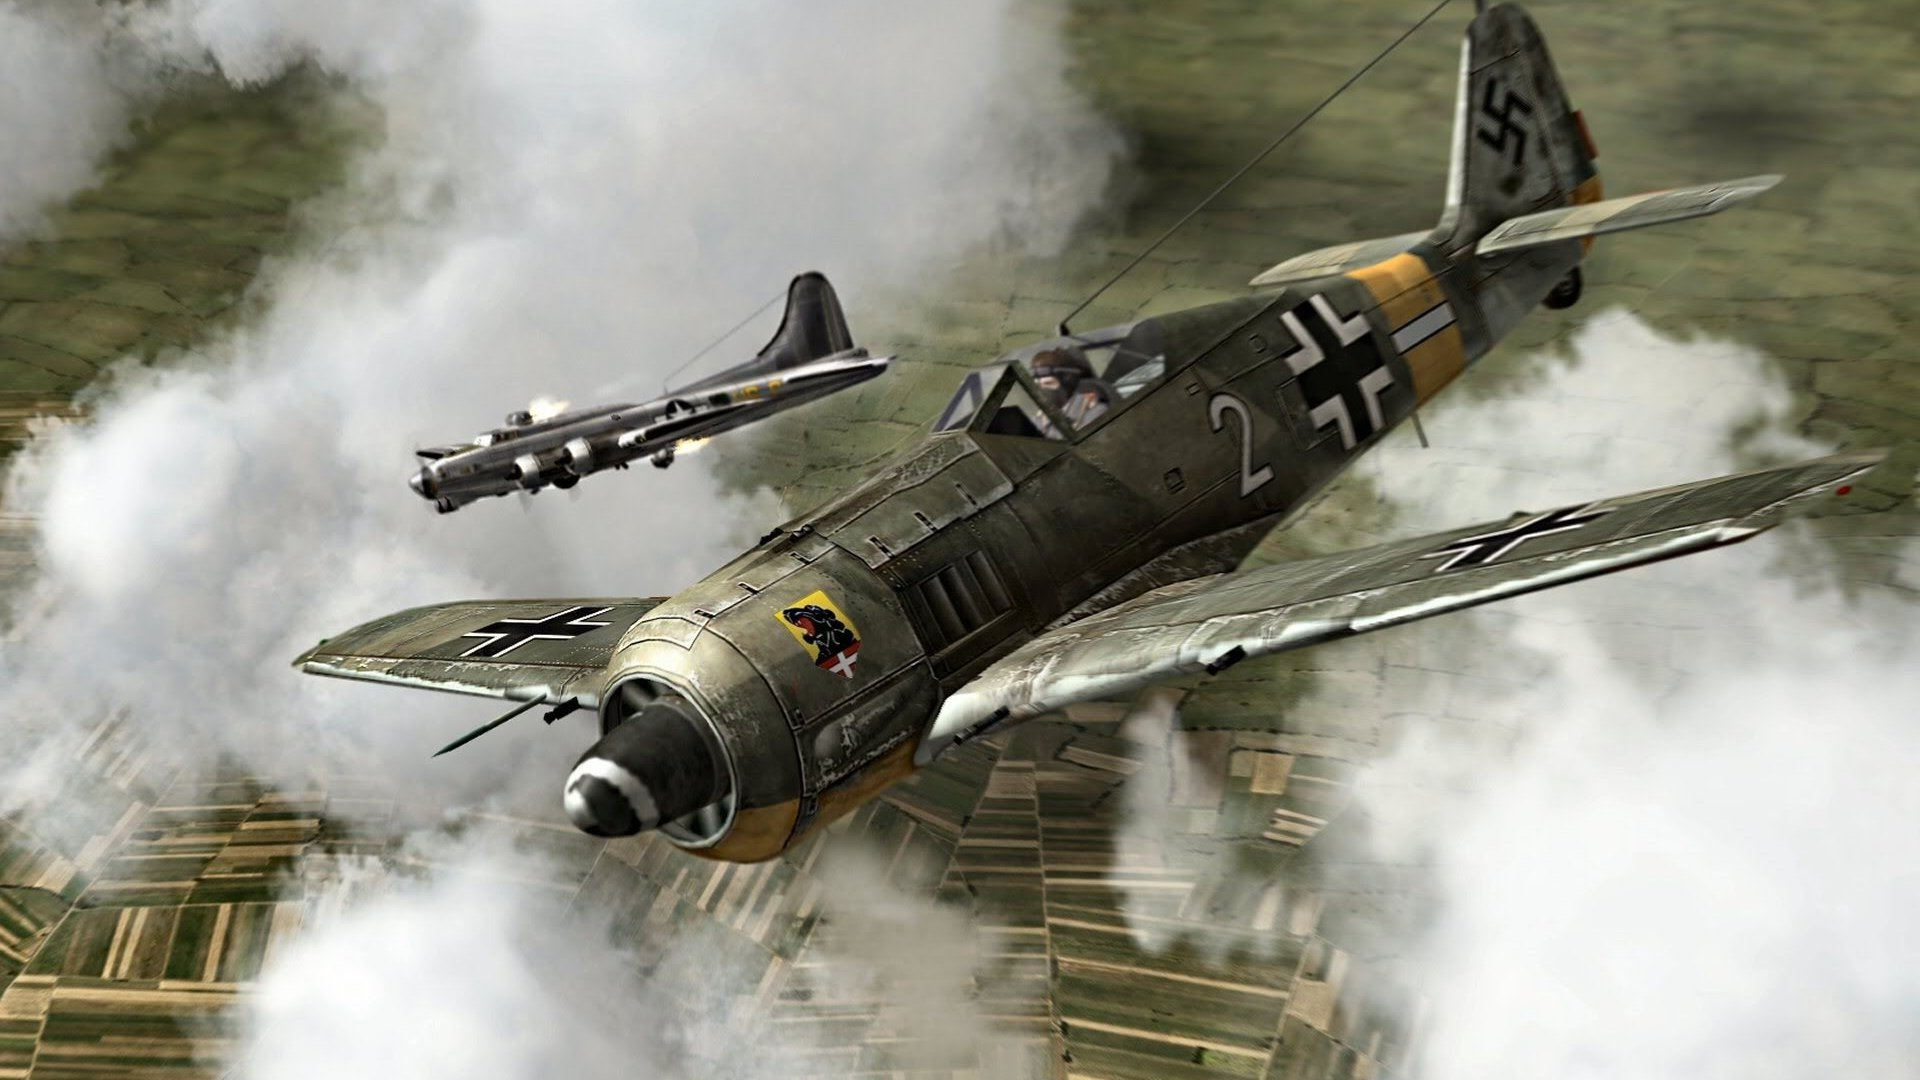 190 Vertical Wallpaper Hd: FW 190 Takes On A B-17 HD Wallpaper